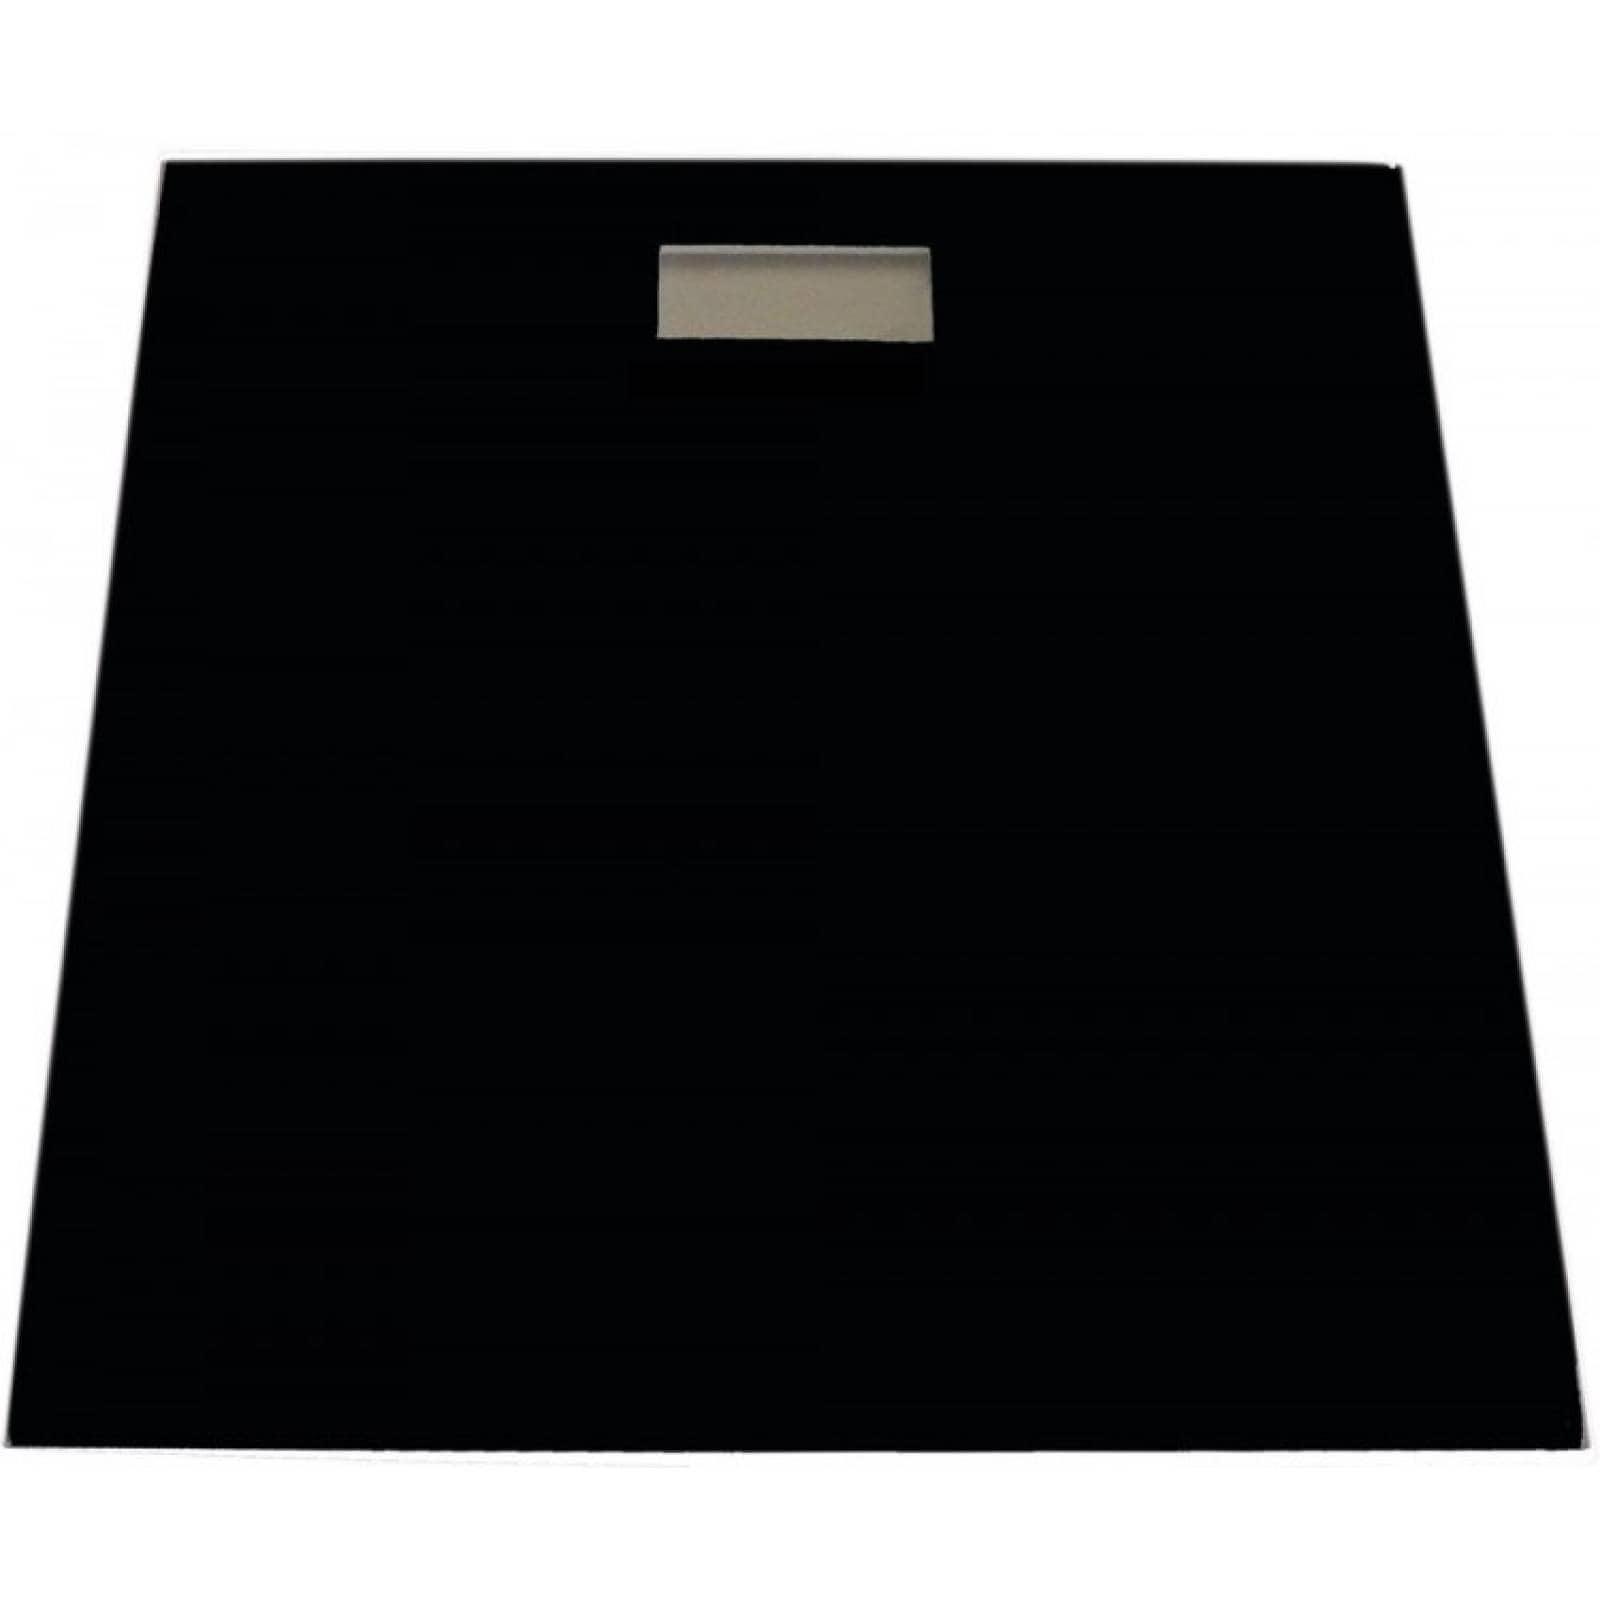 Bascula Electronica Hogar Baño Capacidad 180Kg Silverline